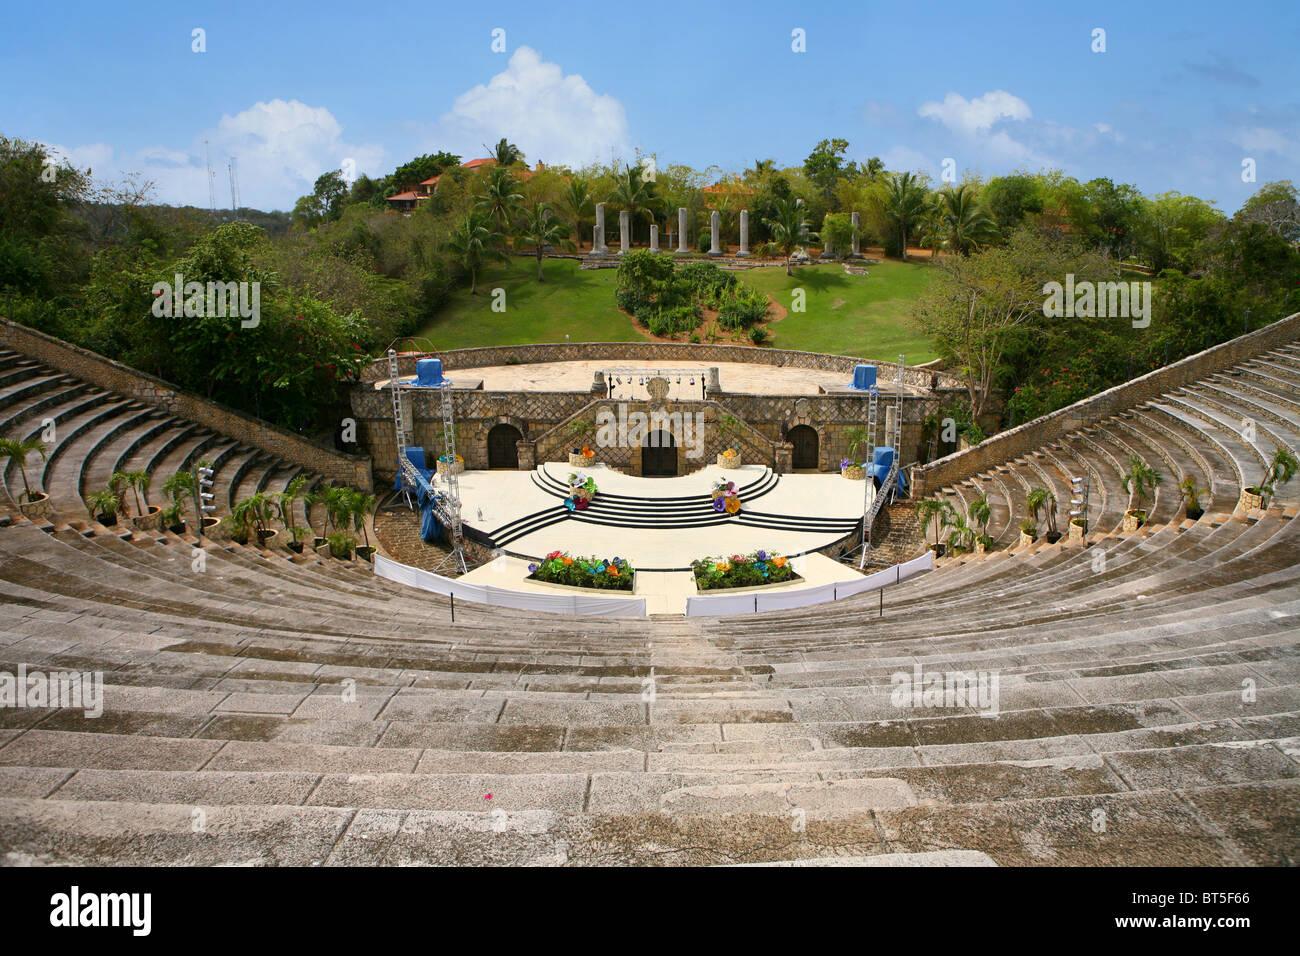 Amphitheatre in altos de chavon casa de campo la romana dominican stock photo royalty free - Casa de campo la romana ...